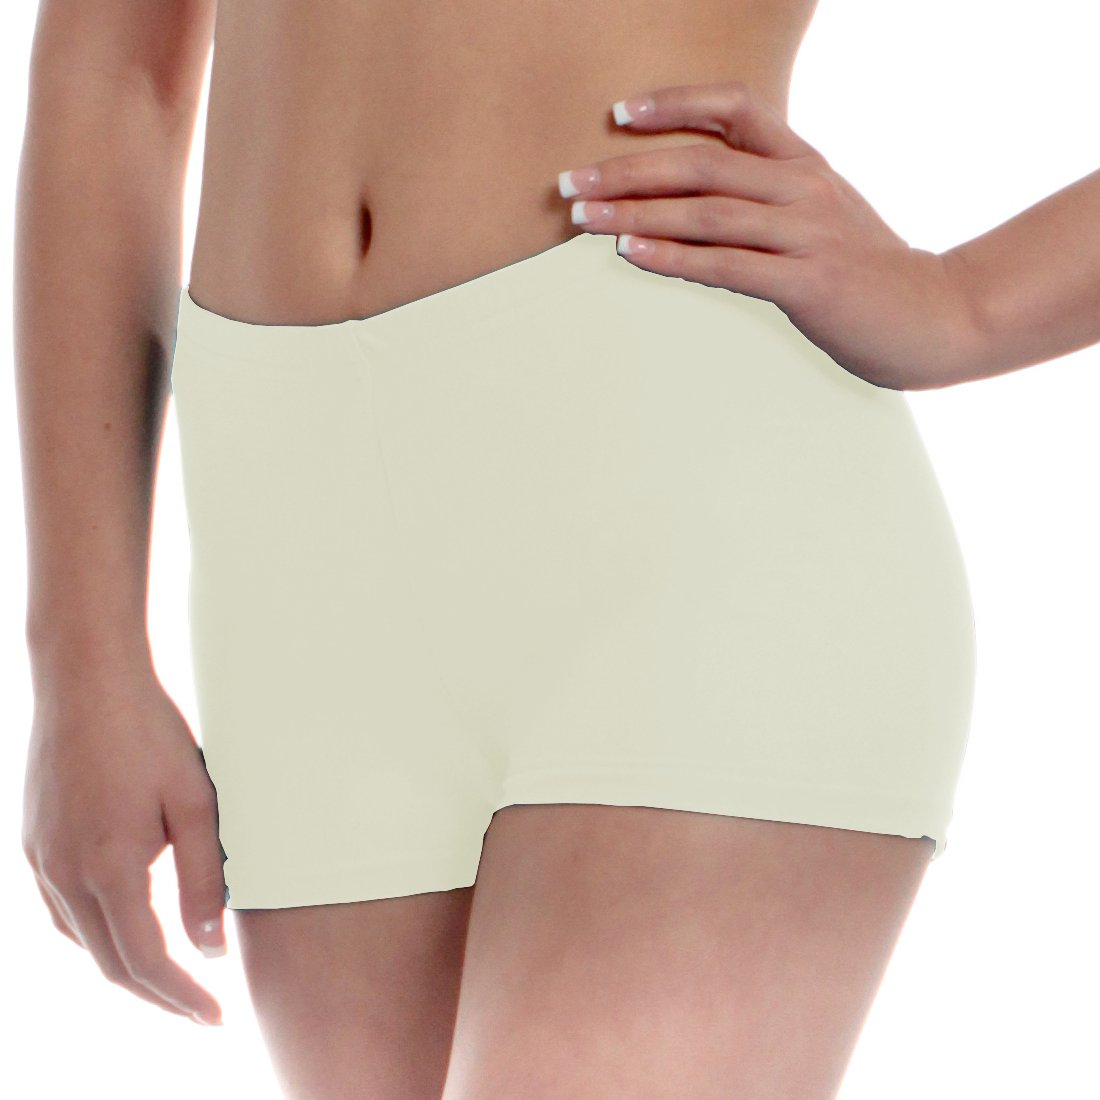 Mens Long Dance Shorts Extra Small Ivory by B Dancewear Adult Sizes by Bailar Dancewear